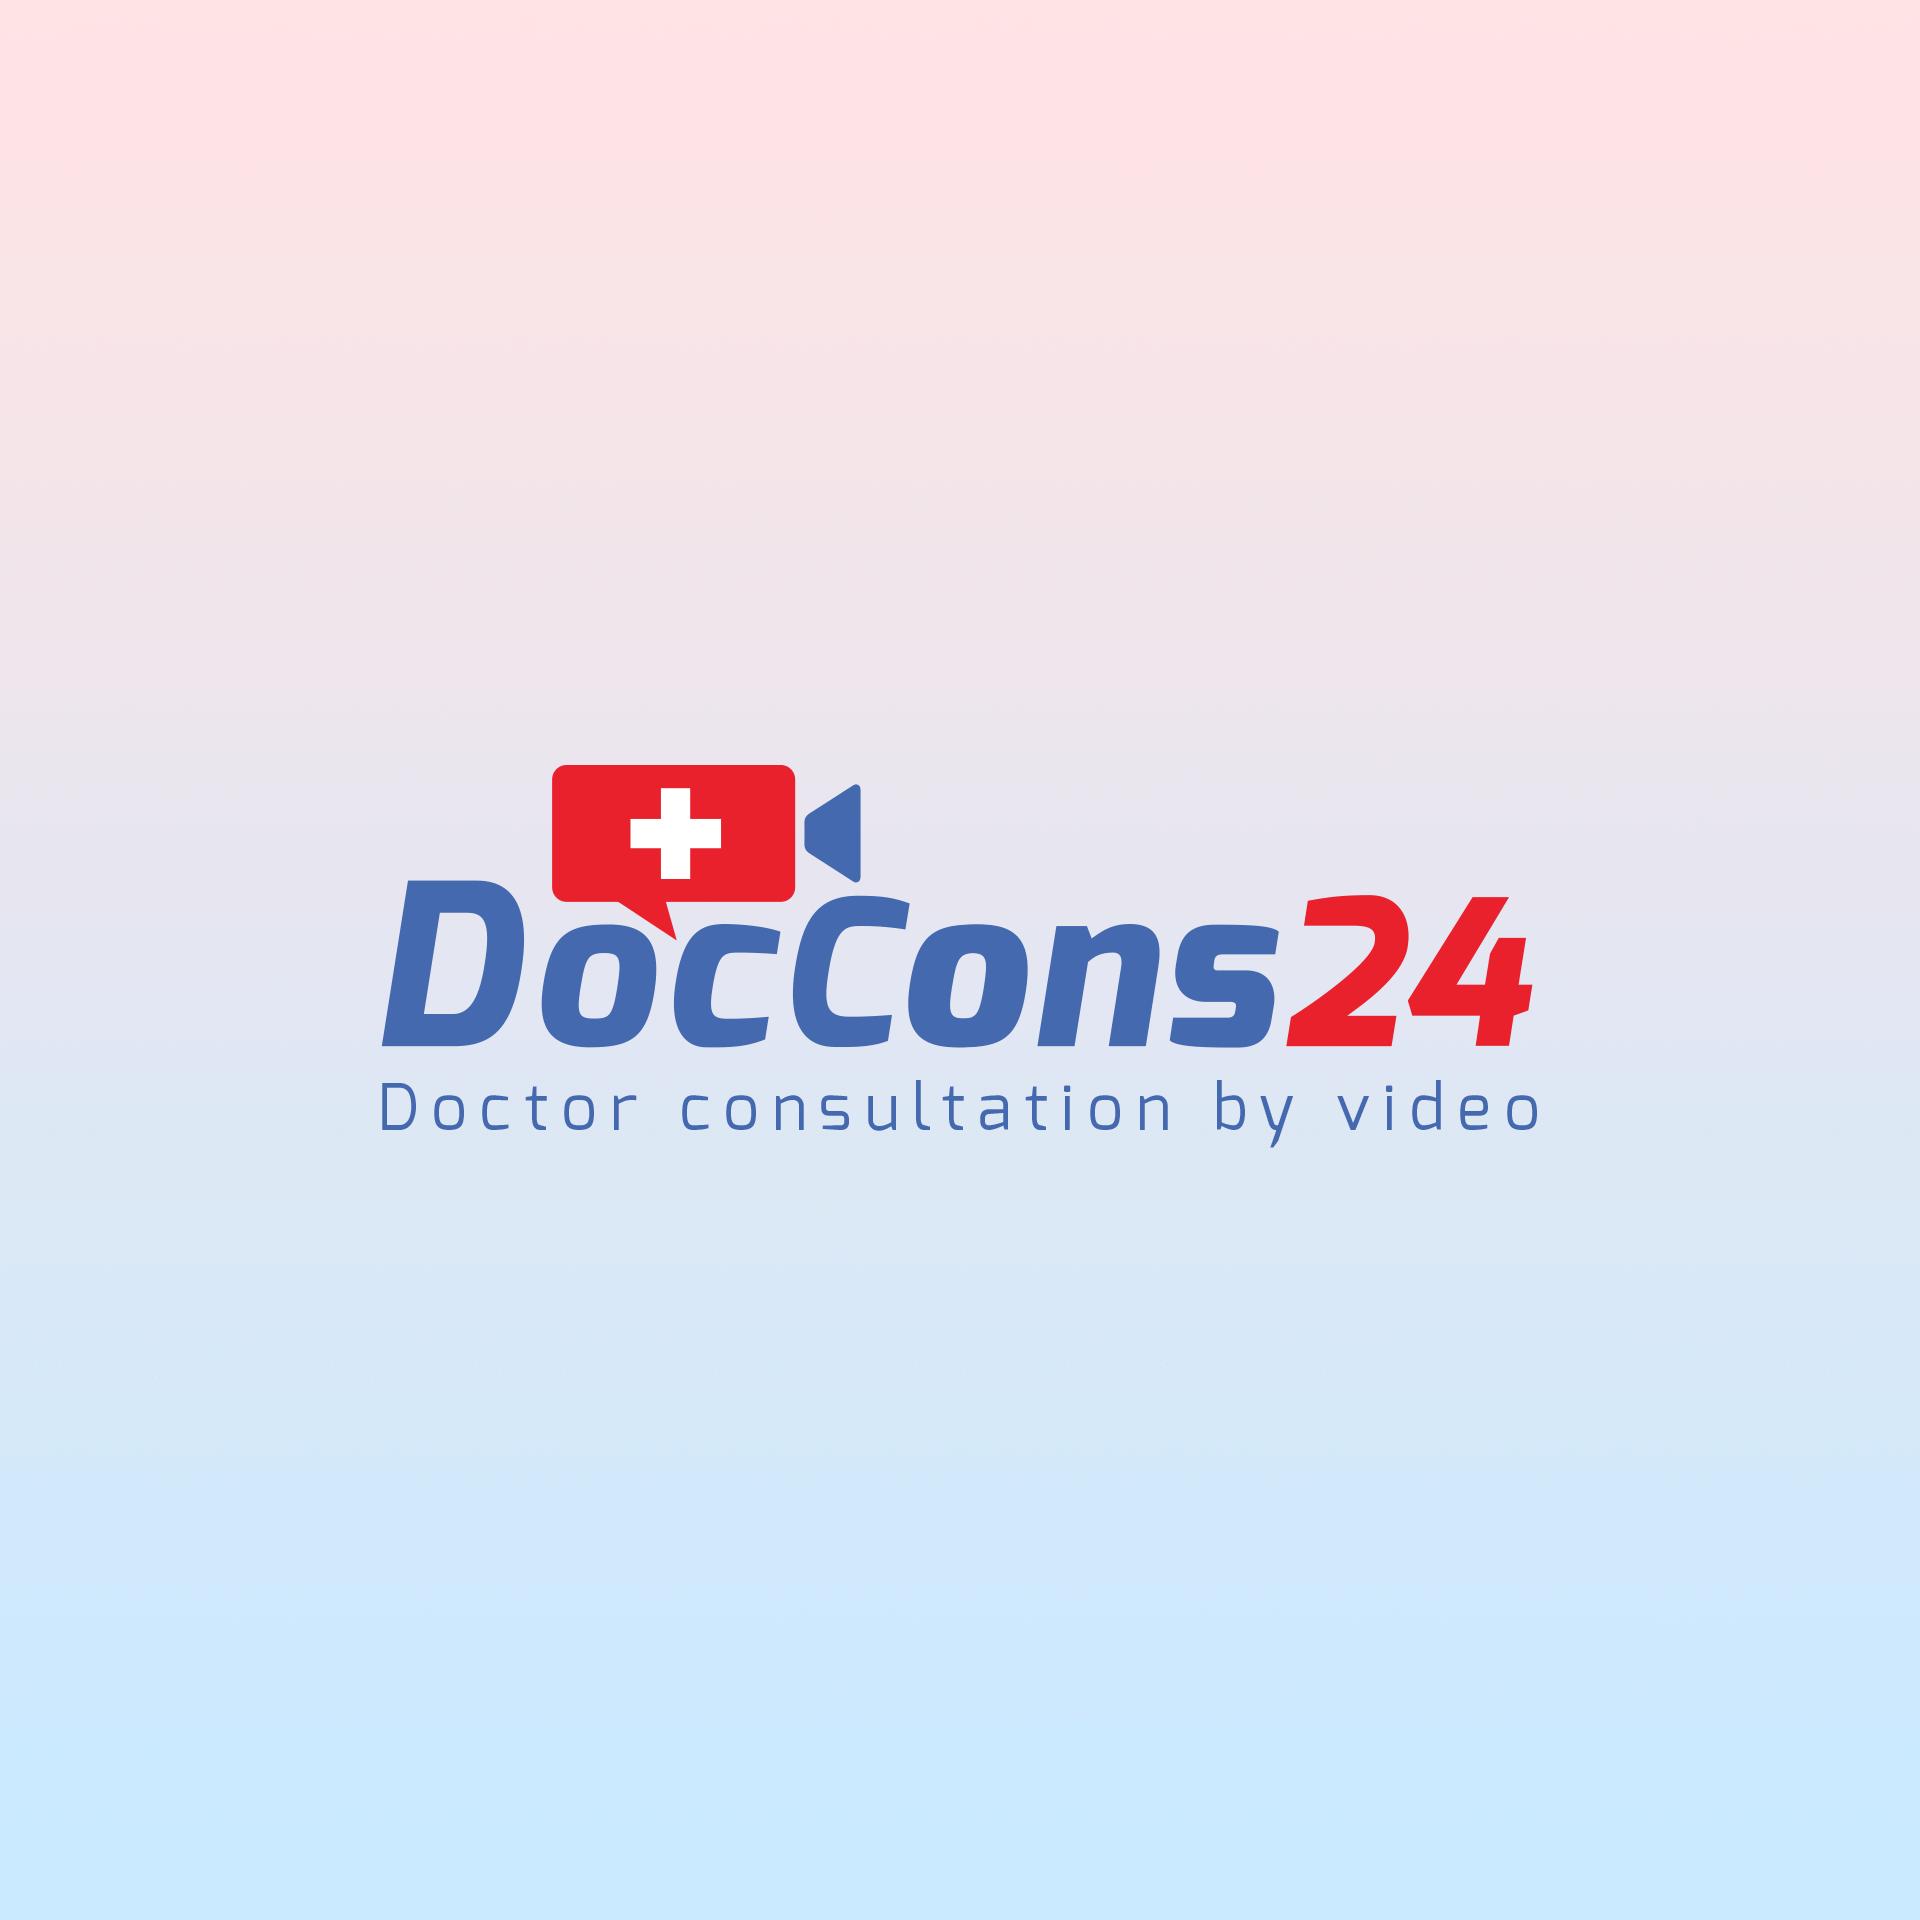 Doccons